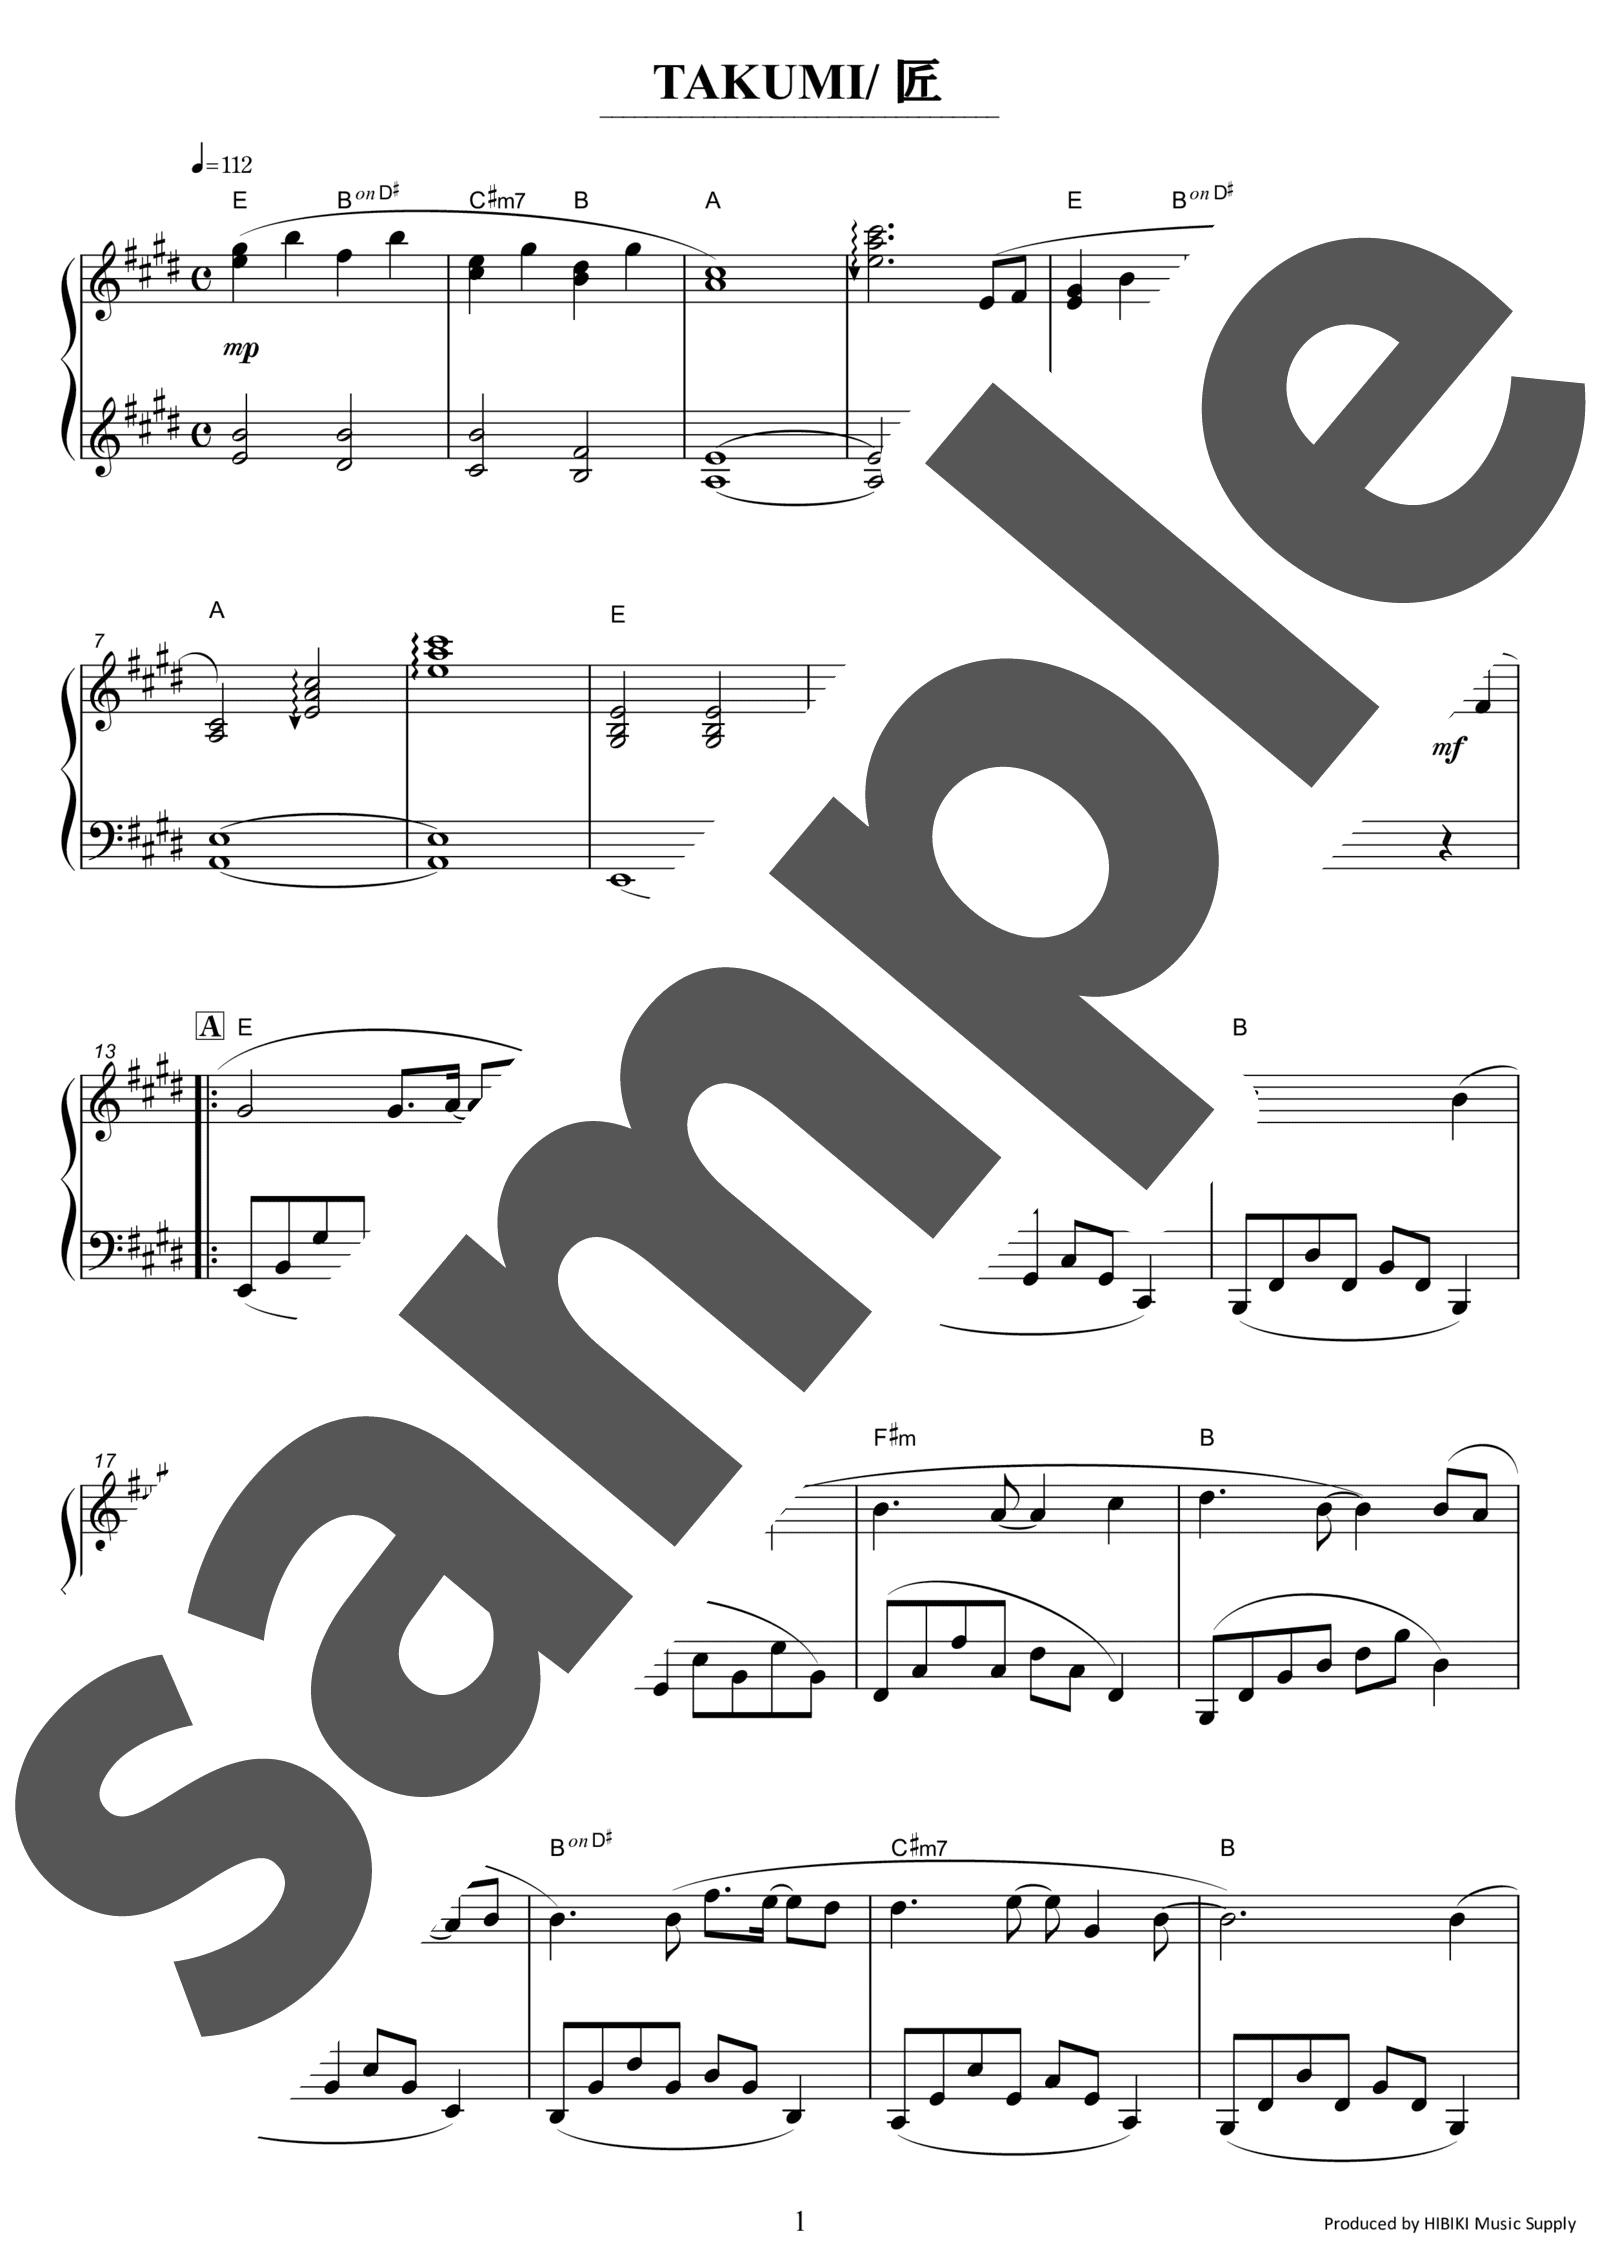 「TAKUMI/匠」のサンプル楽譜